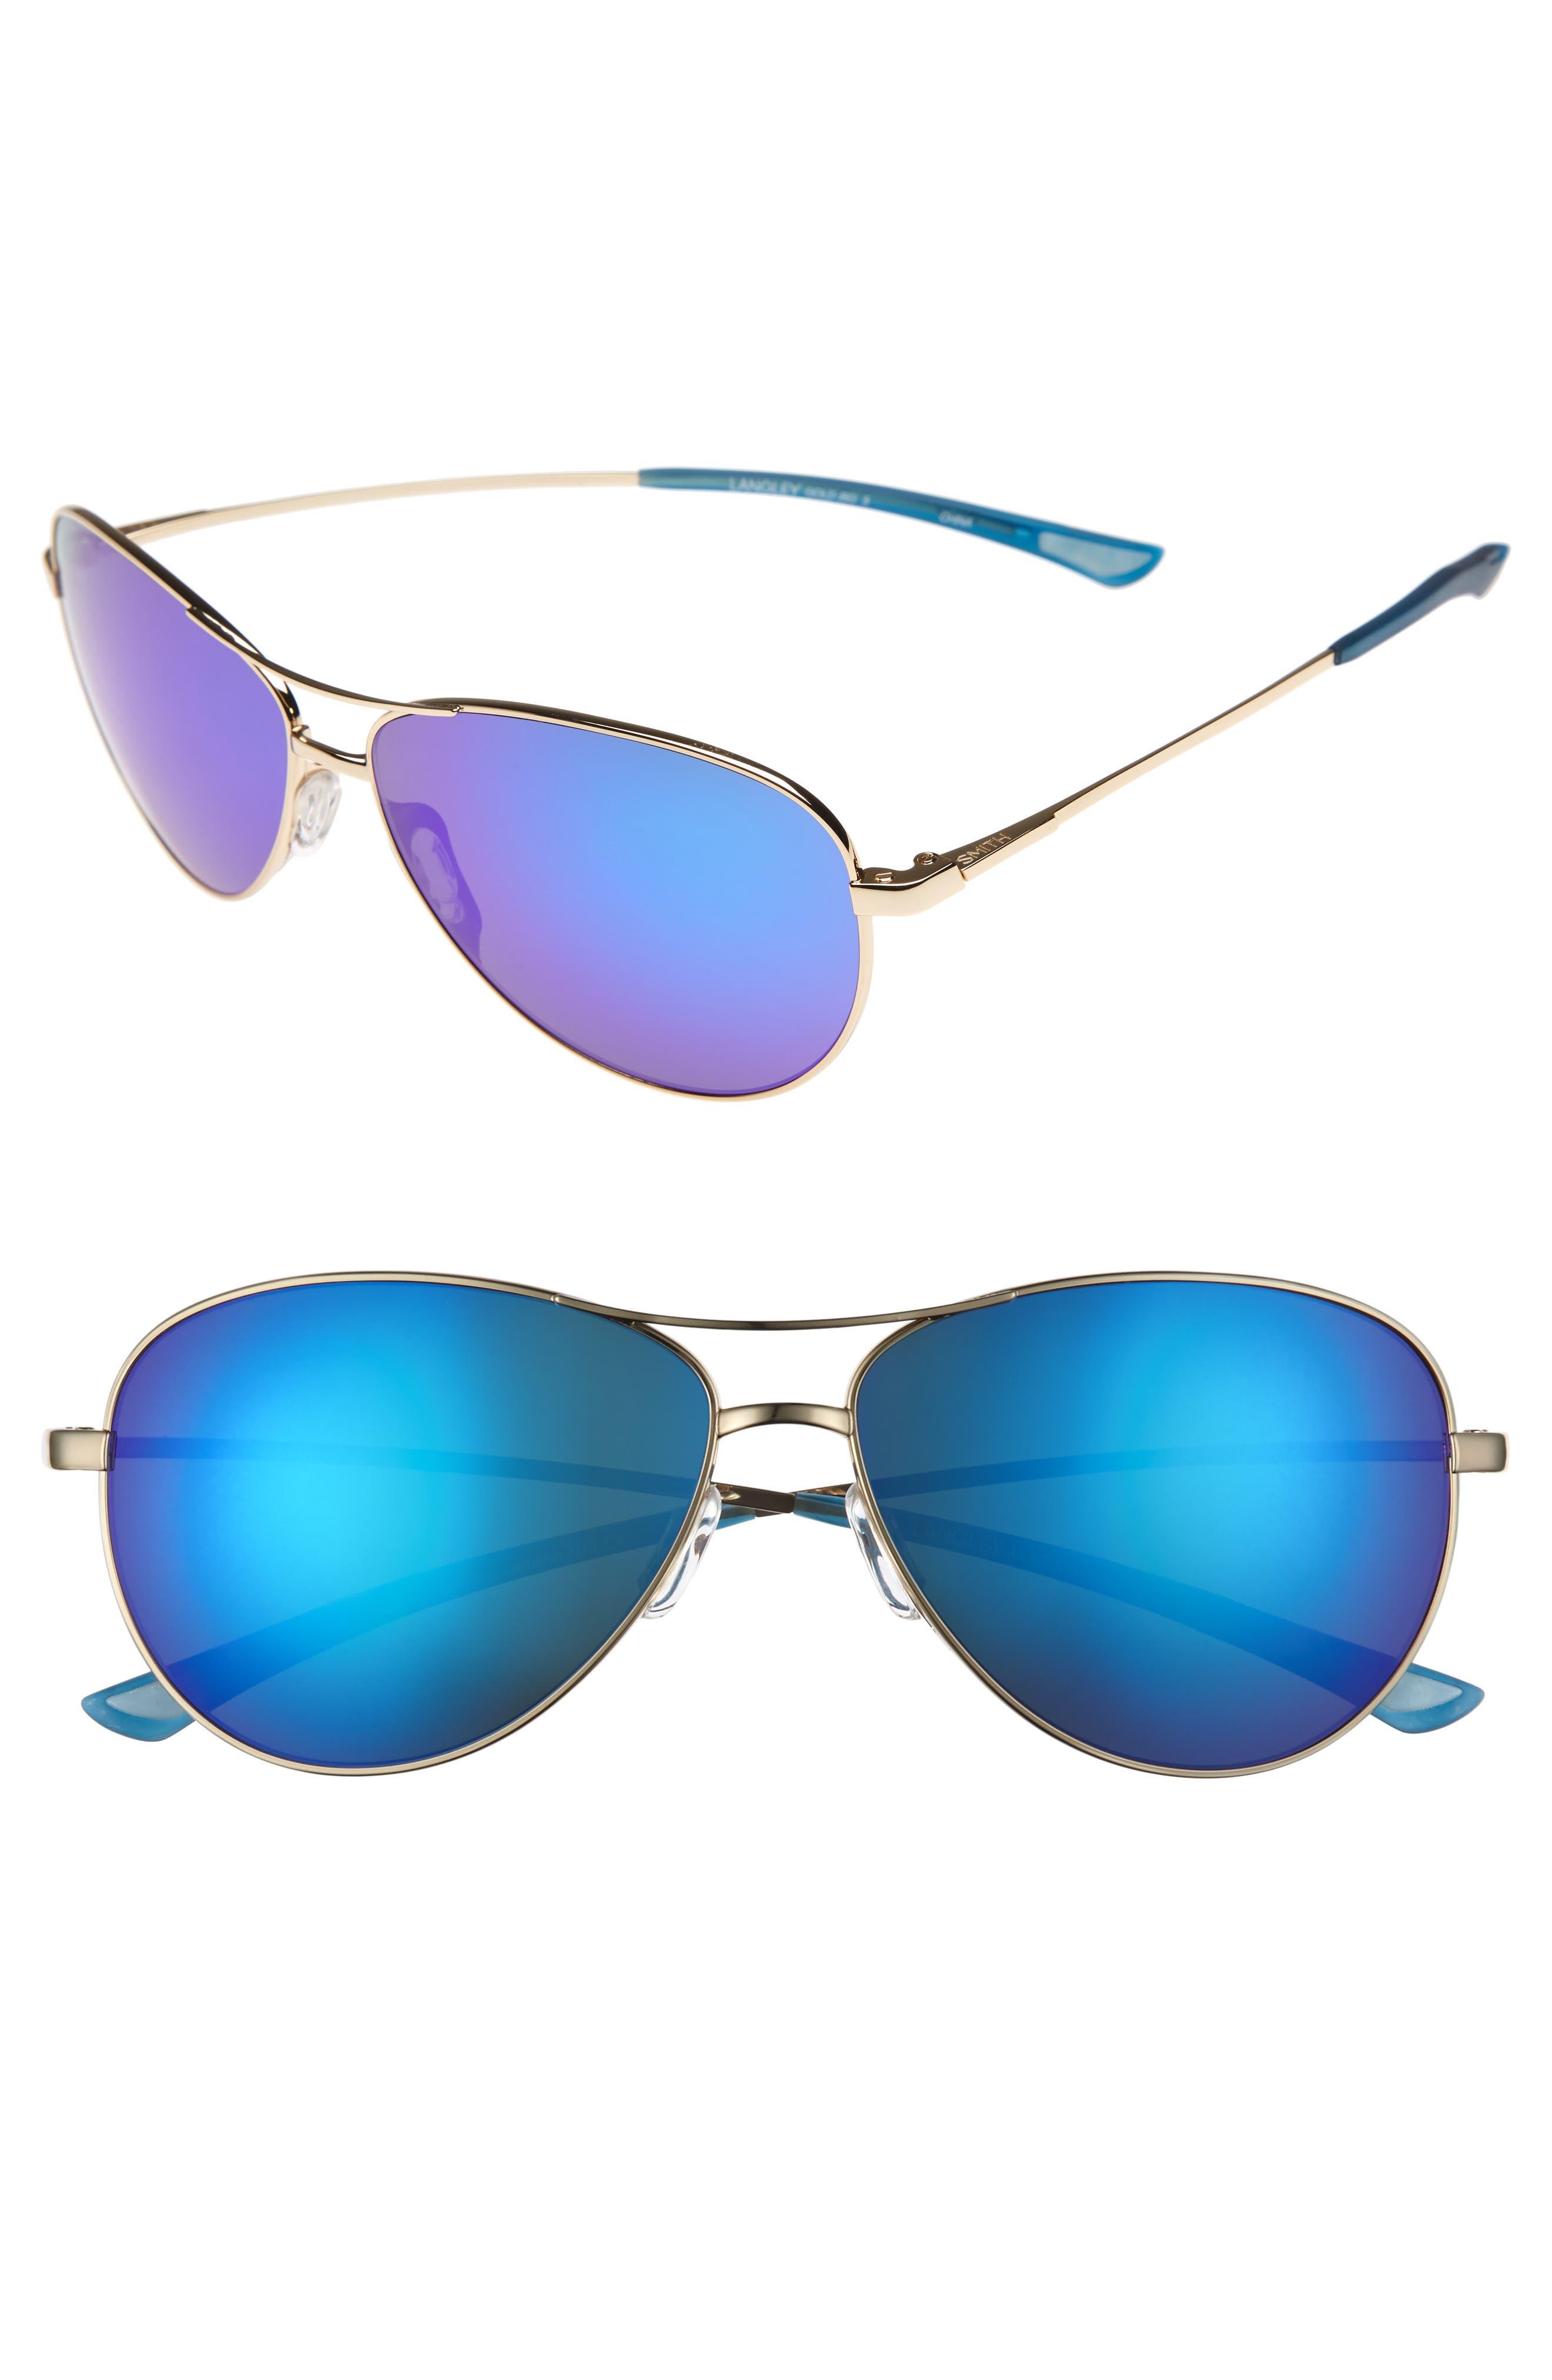 'Langley' 60mm Aviator Sunglasses,                             Main thumbnail 1, color,                             GOLD/ BLUE